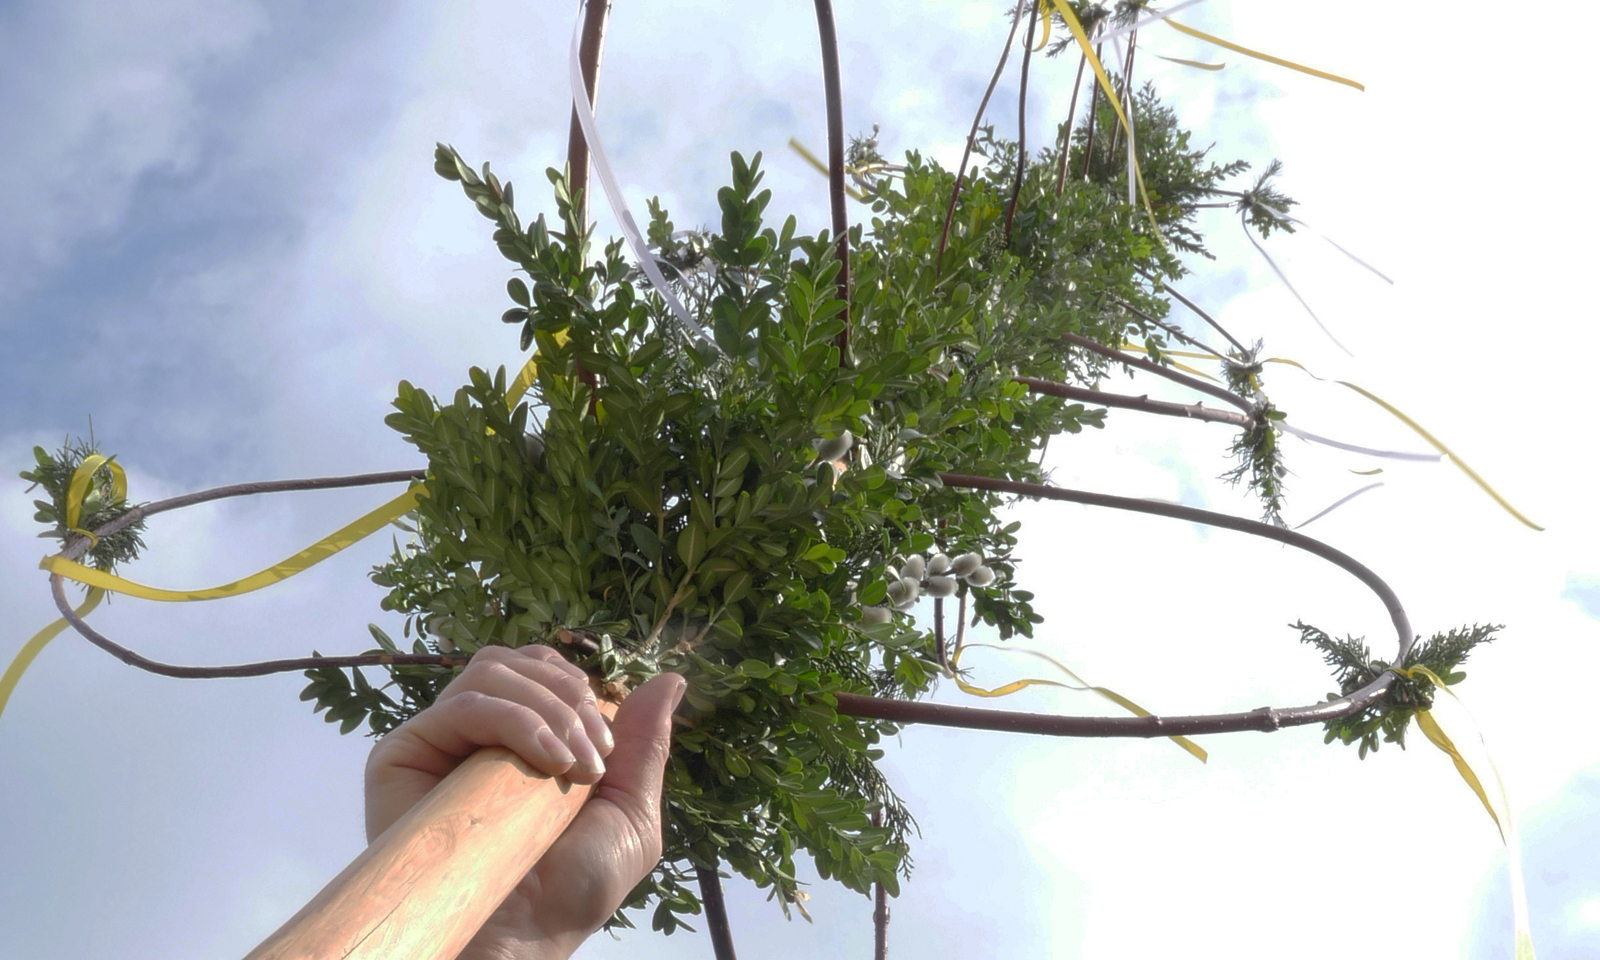 200405 Palmsonntag foto1 MF